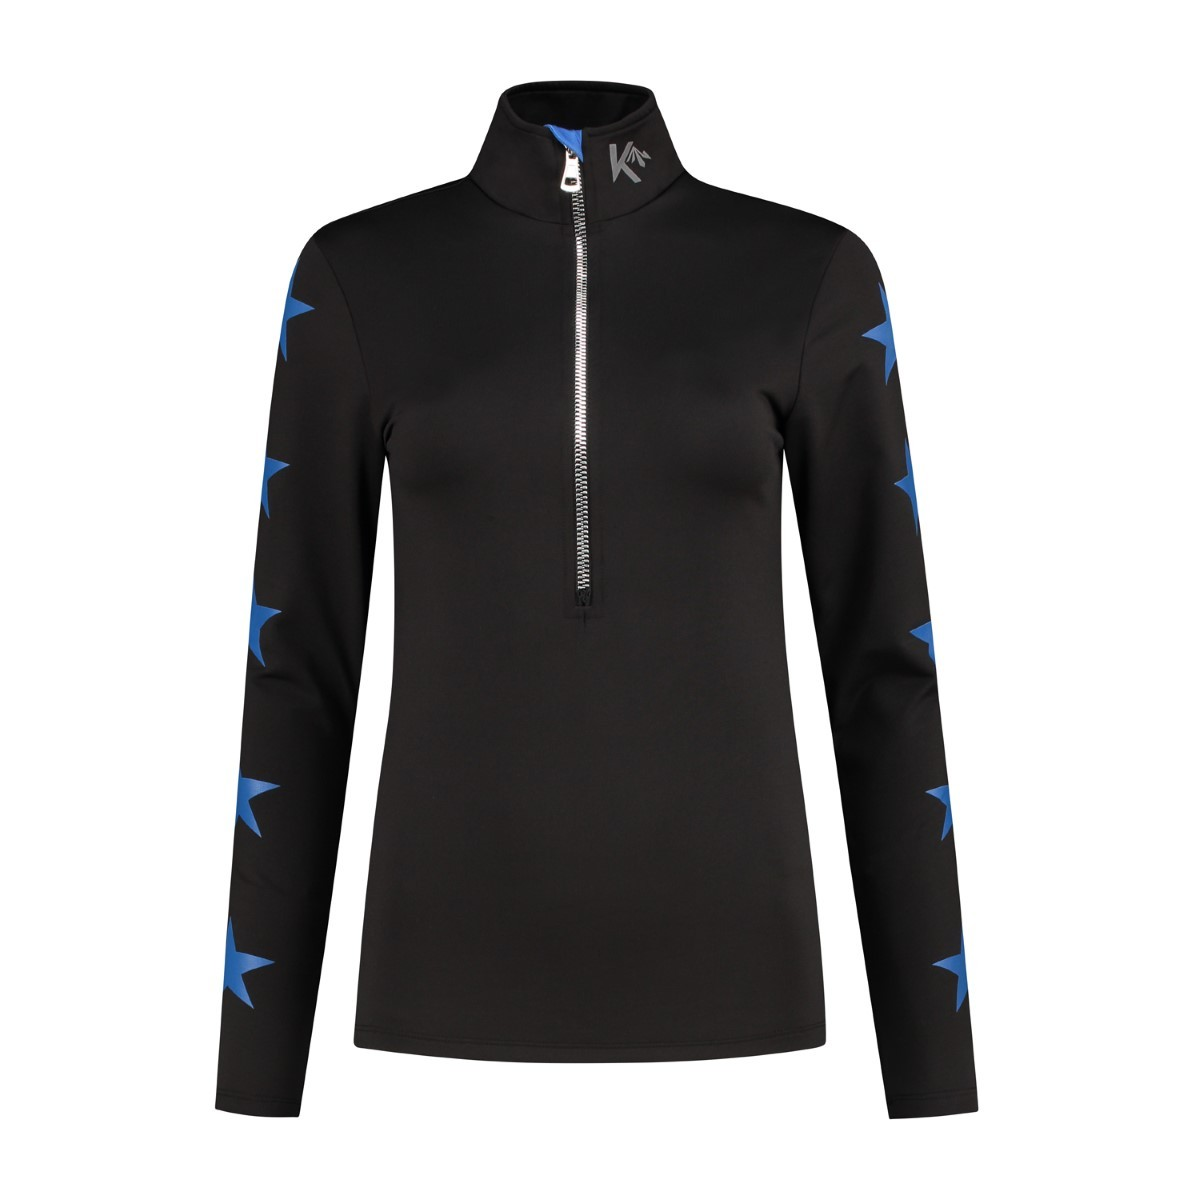 Kou Sportswear 2nd layer pully Amparo blue Stars 2020